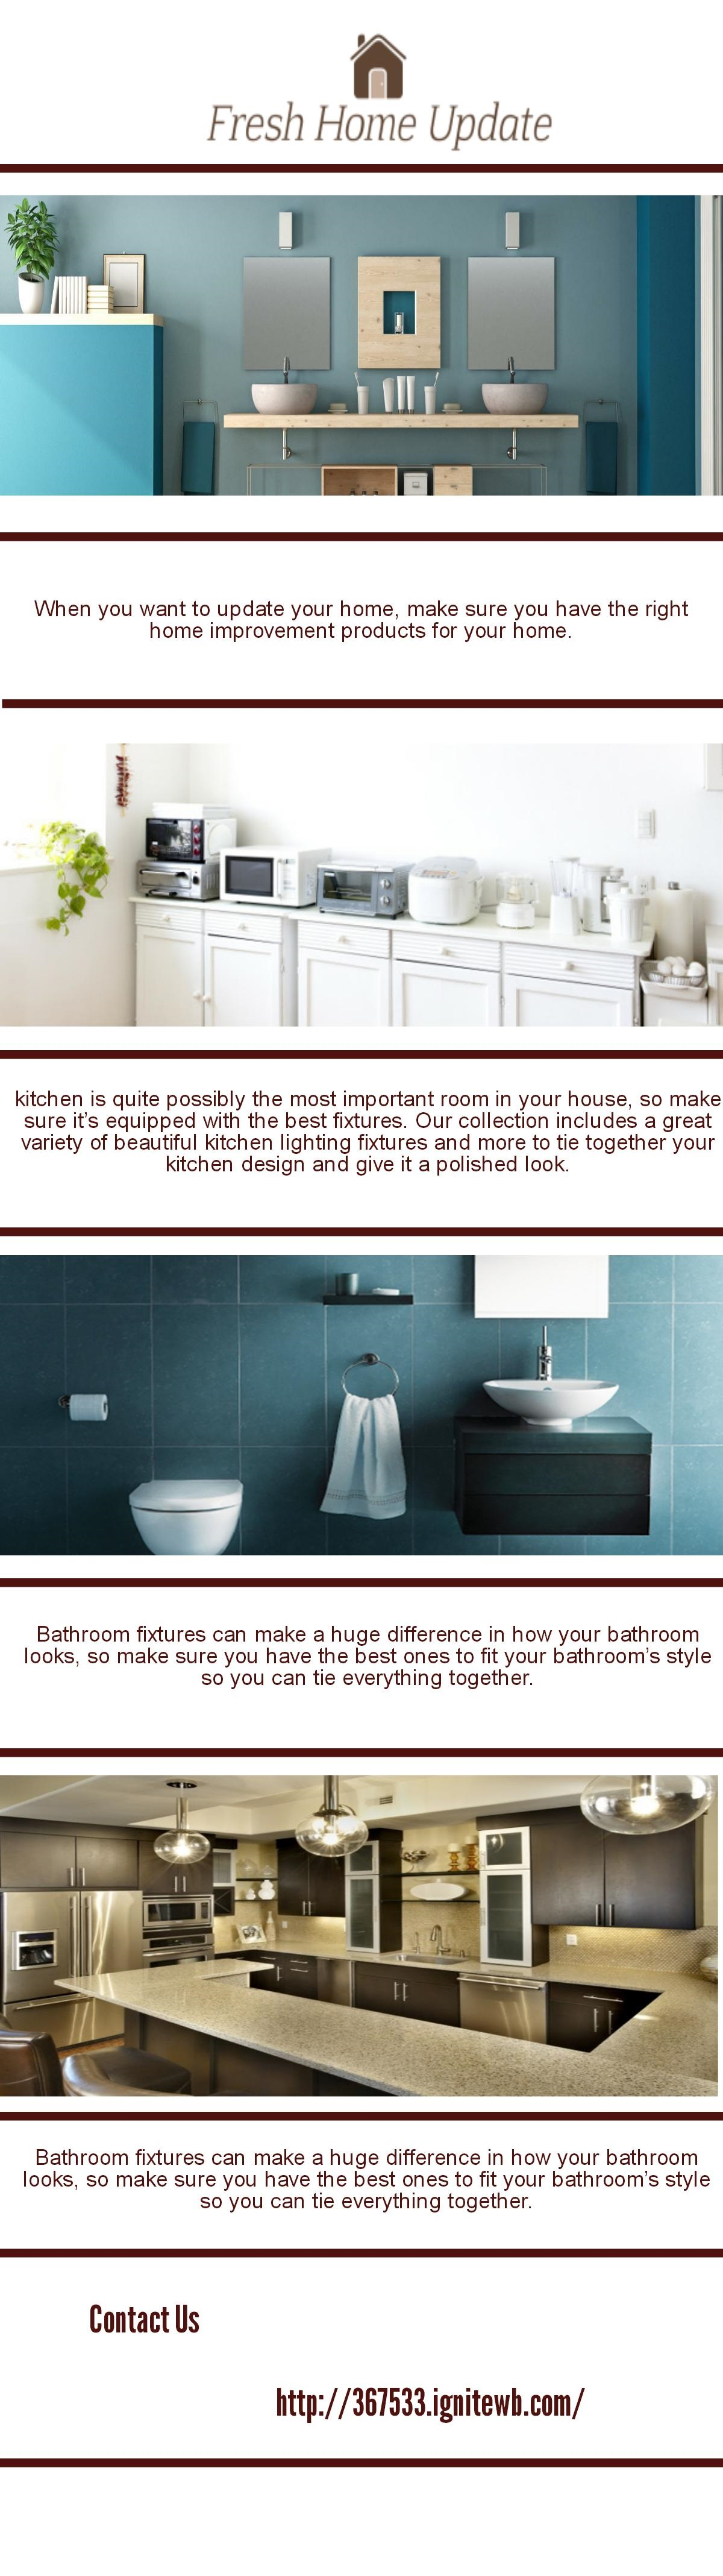 Bathroom Fixtures And Accessories find bathroom fixtures & accessories from top brands at 20-45% off